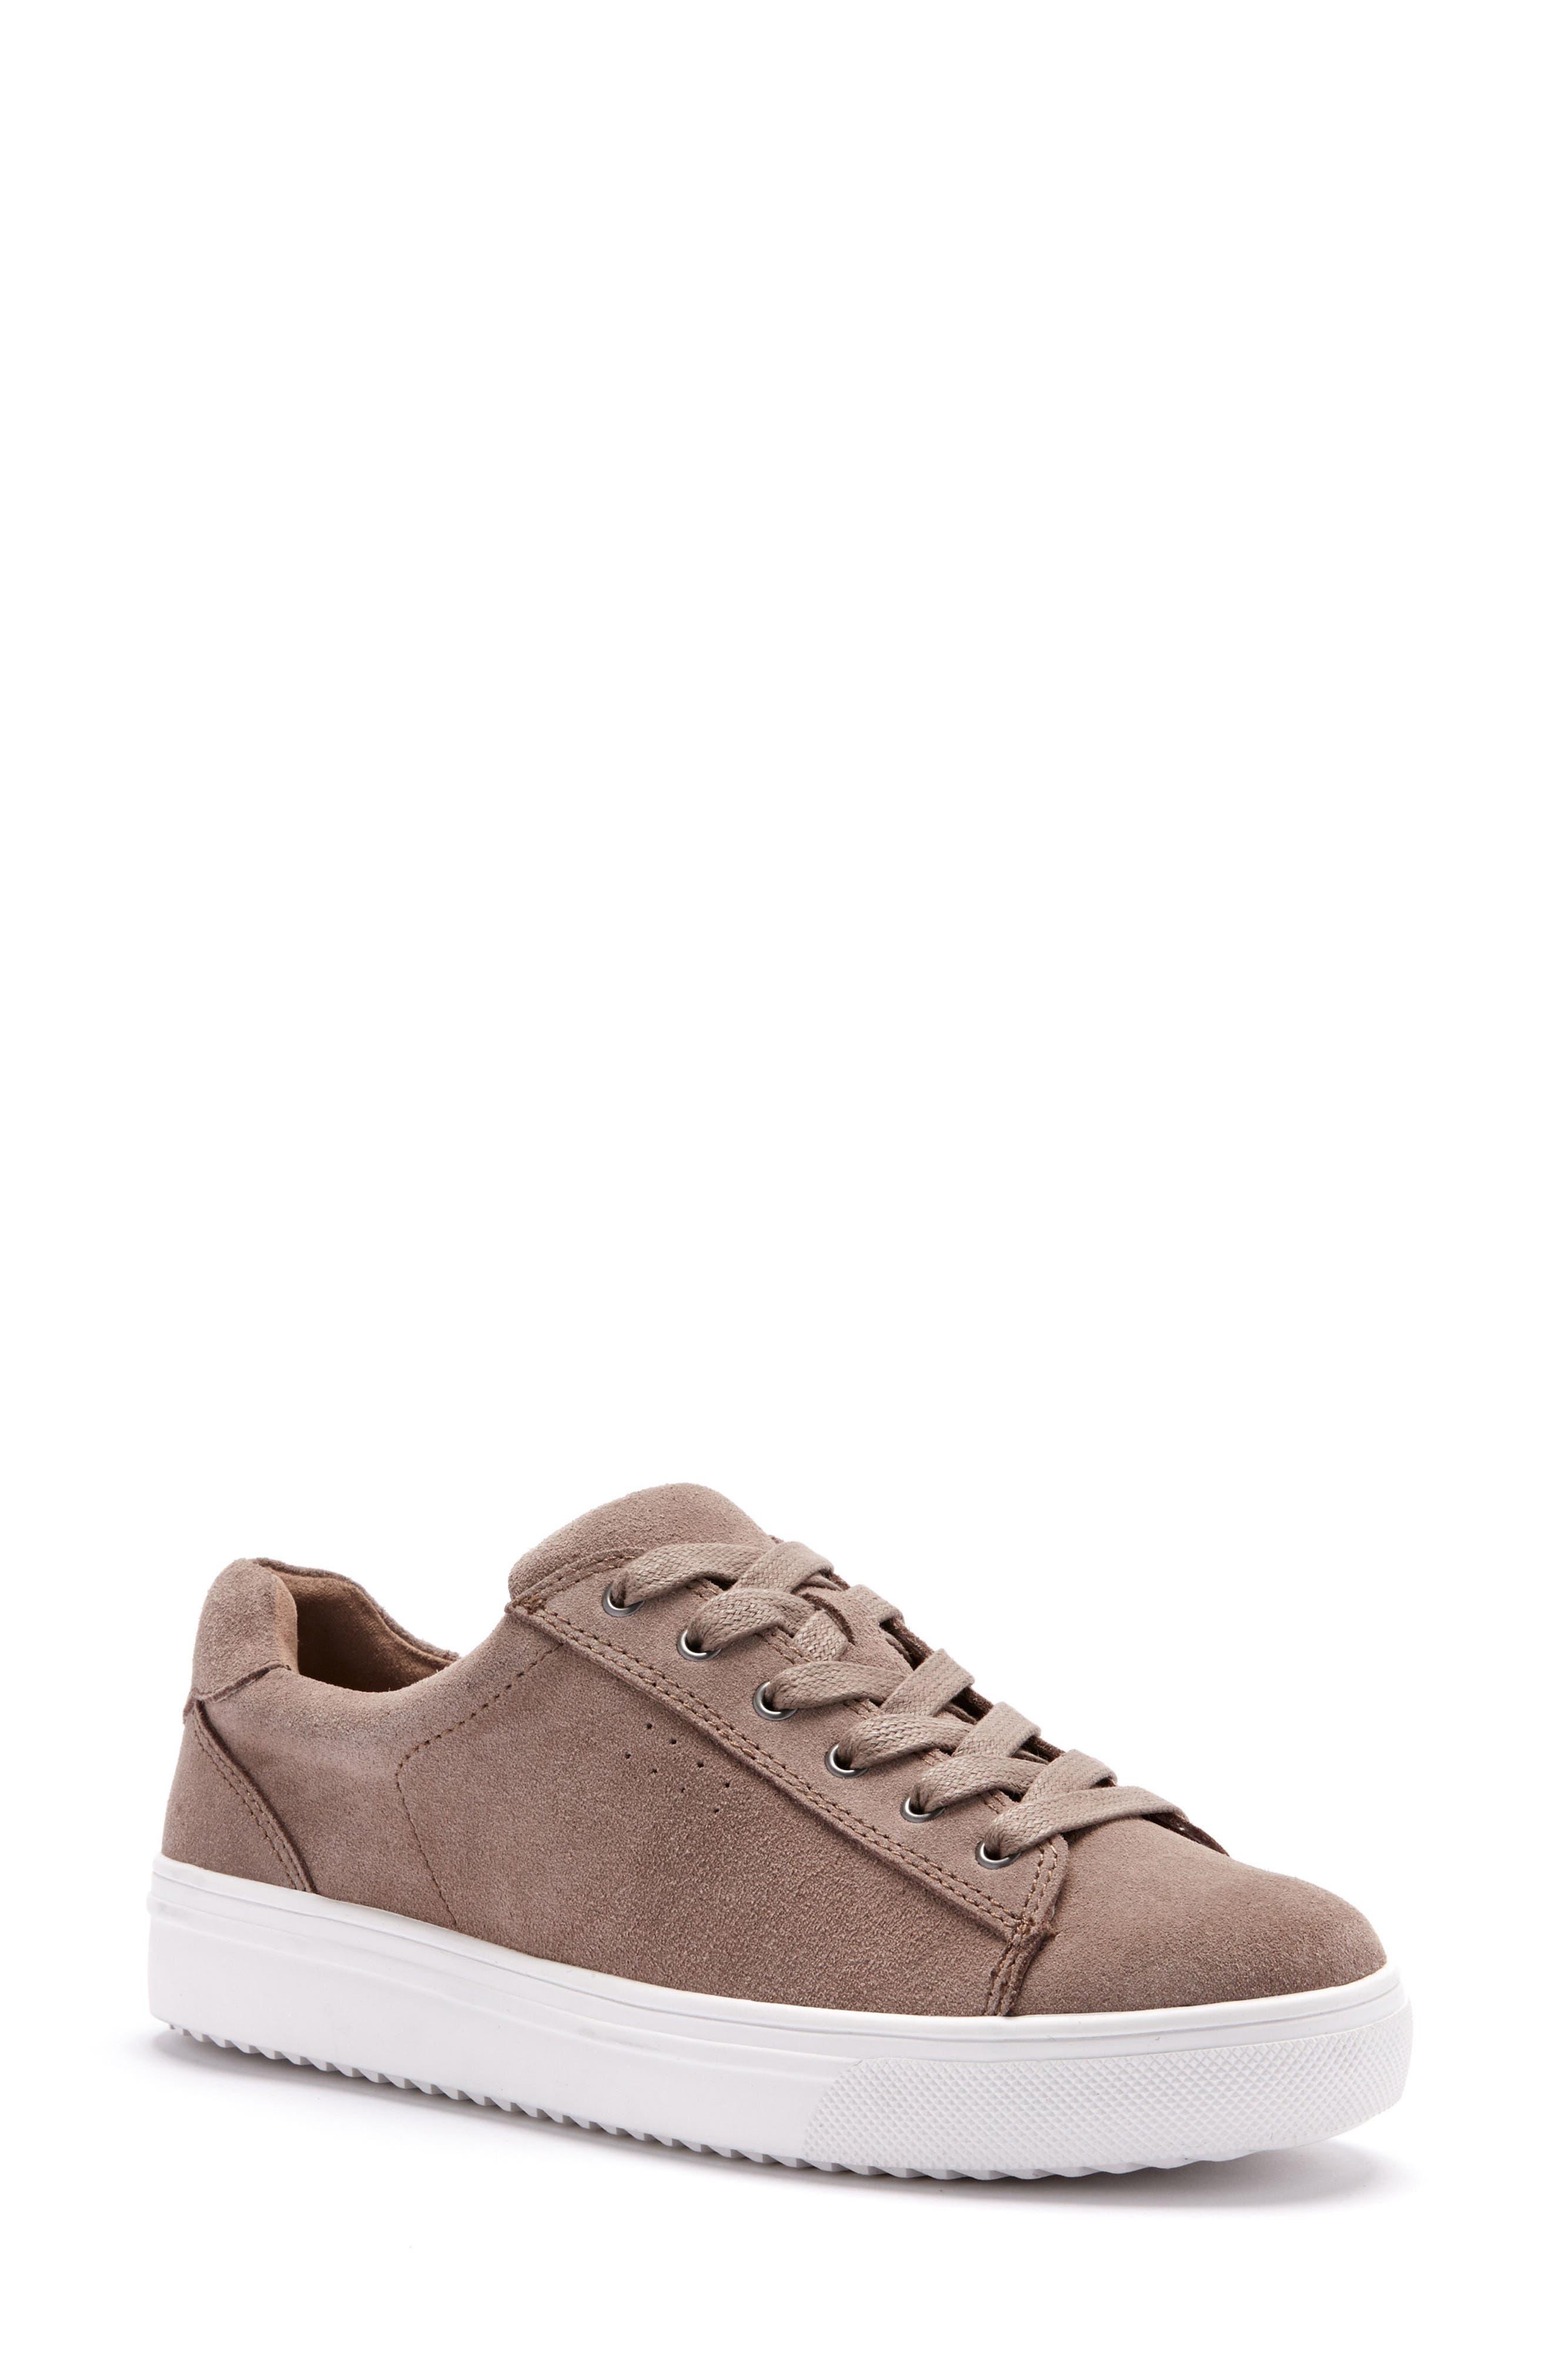 Blondo Jayden Waterproof Sneaker (Women)